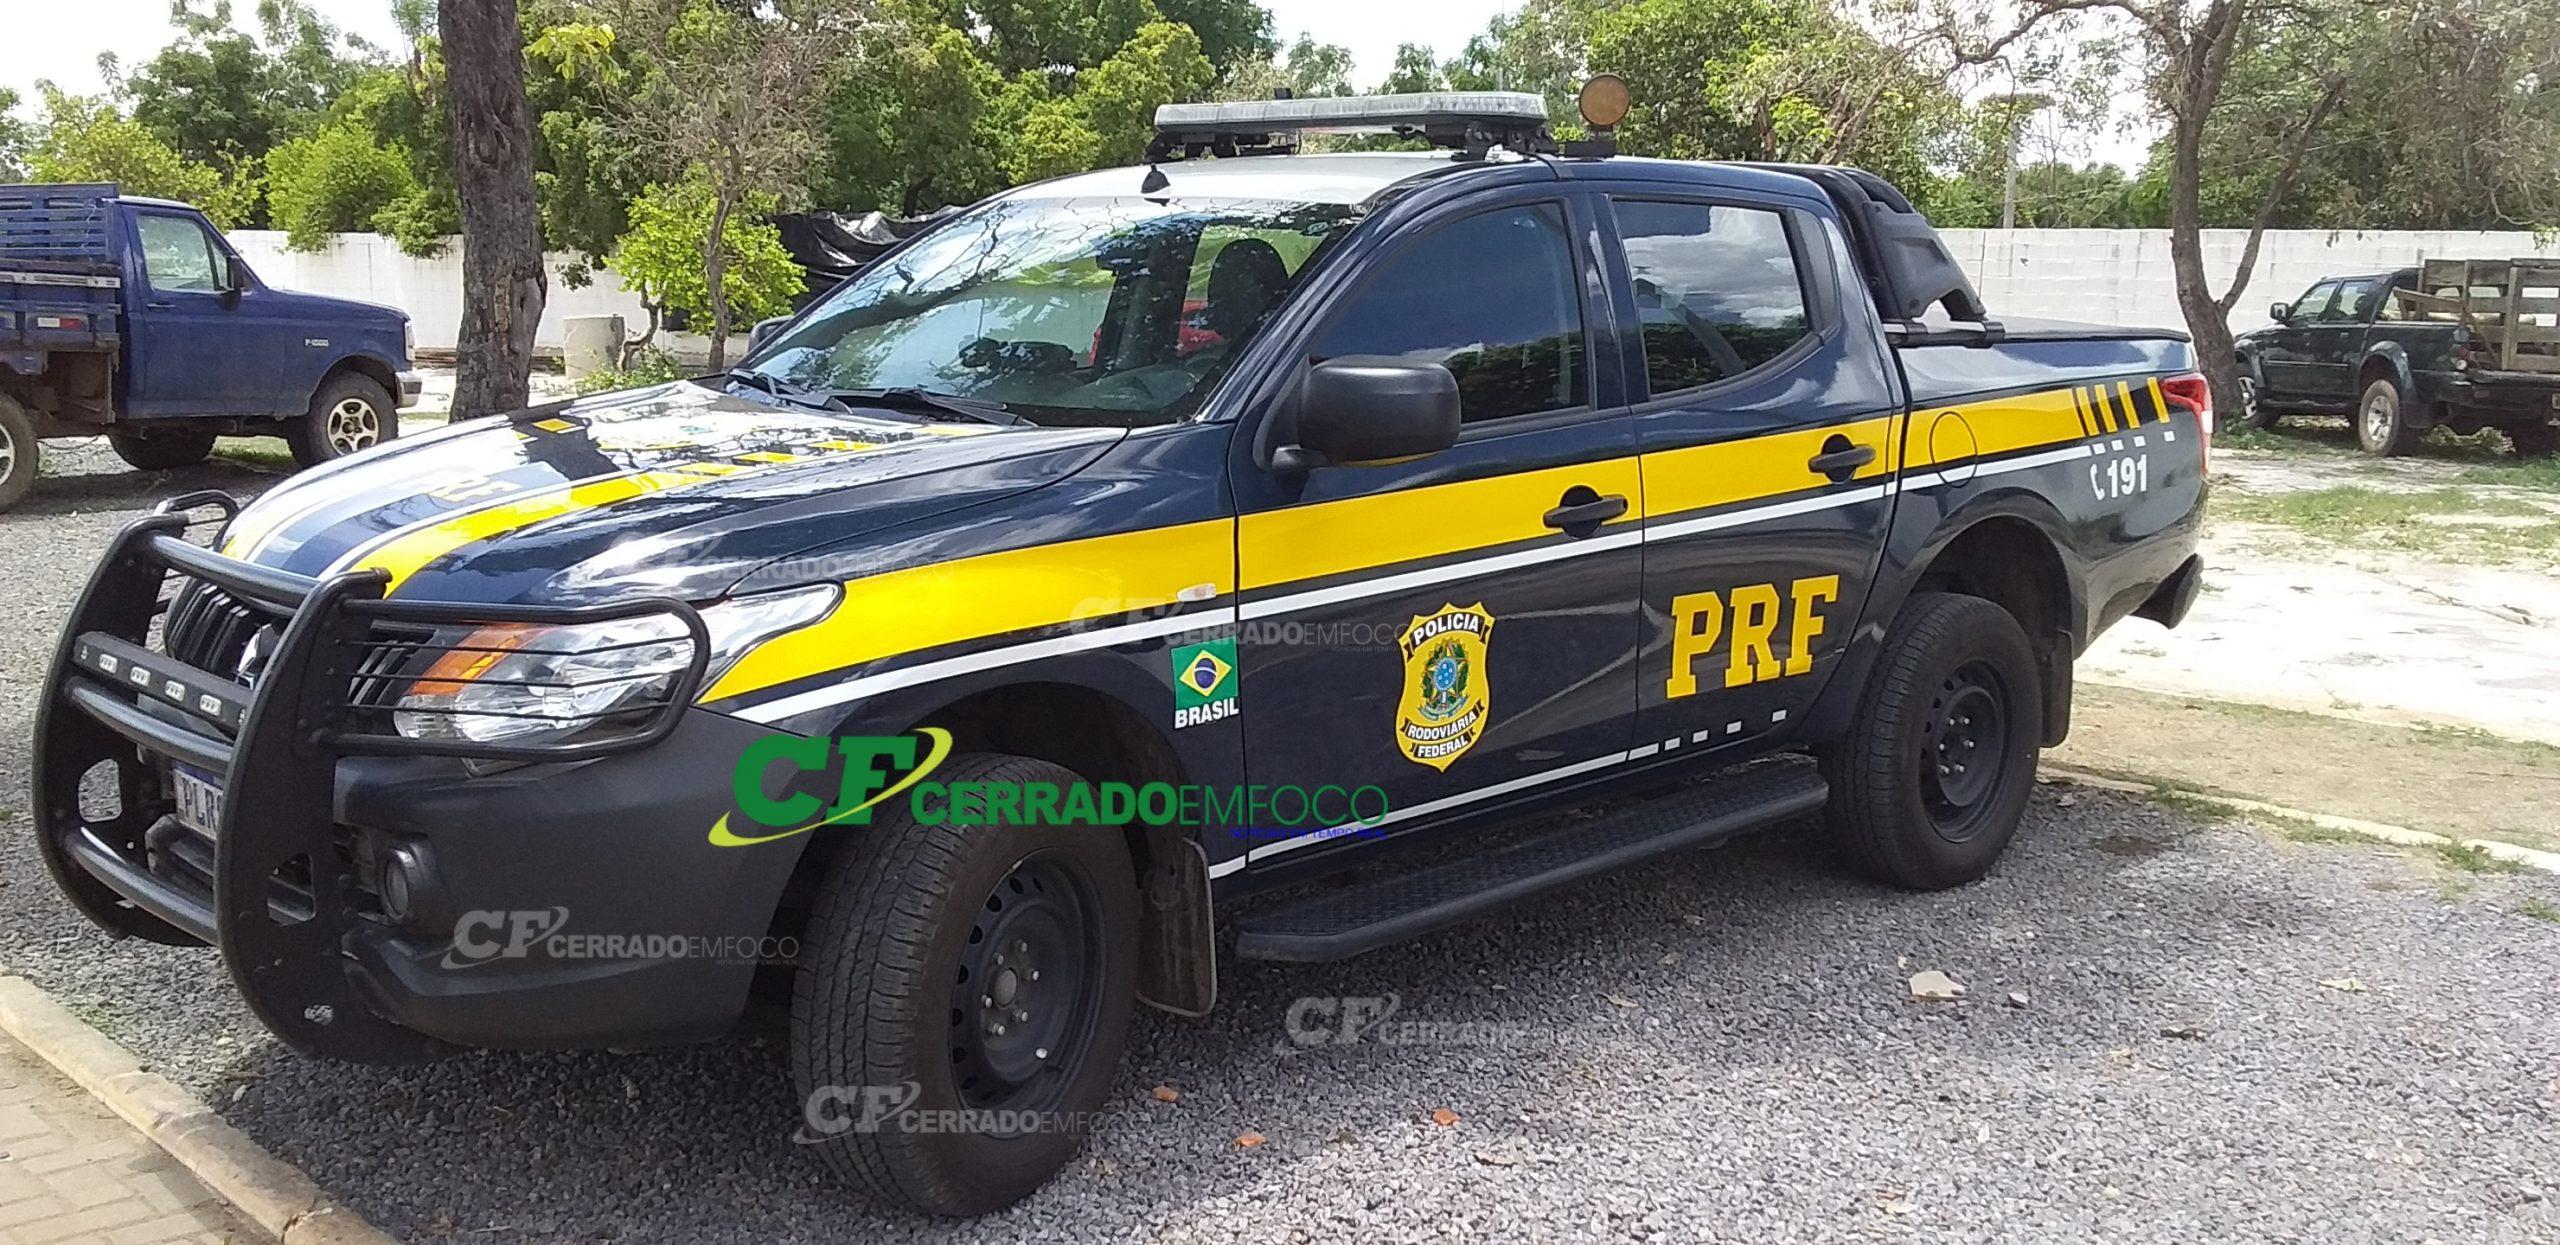 LEM: PRF prende motorista por conduzir veículo automotor alcoolizado